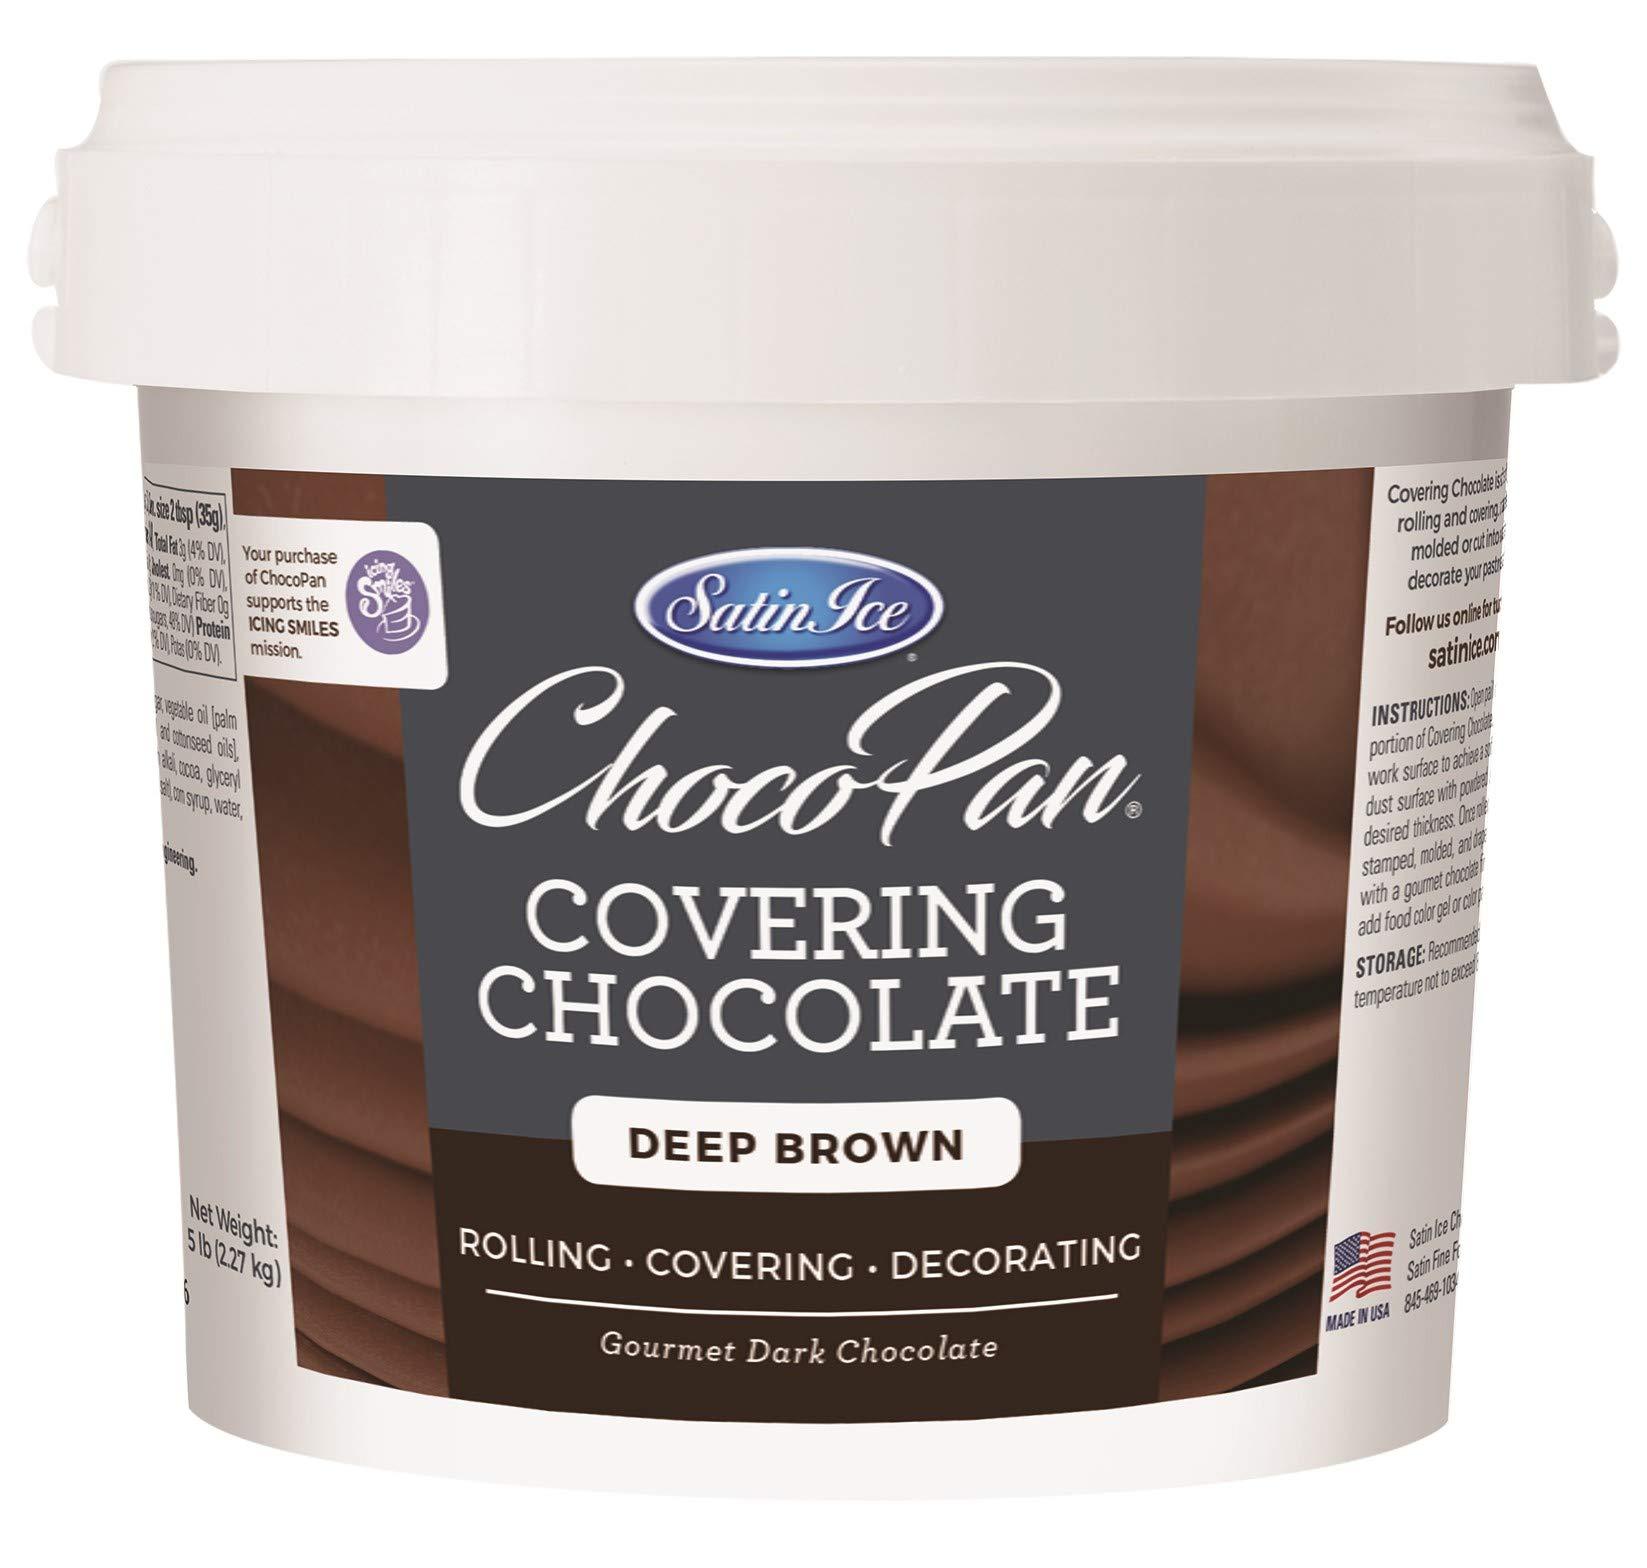 Satin Ice ChocoPan Deep Brown Covering Chocolate, 5 Pounds